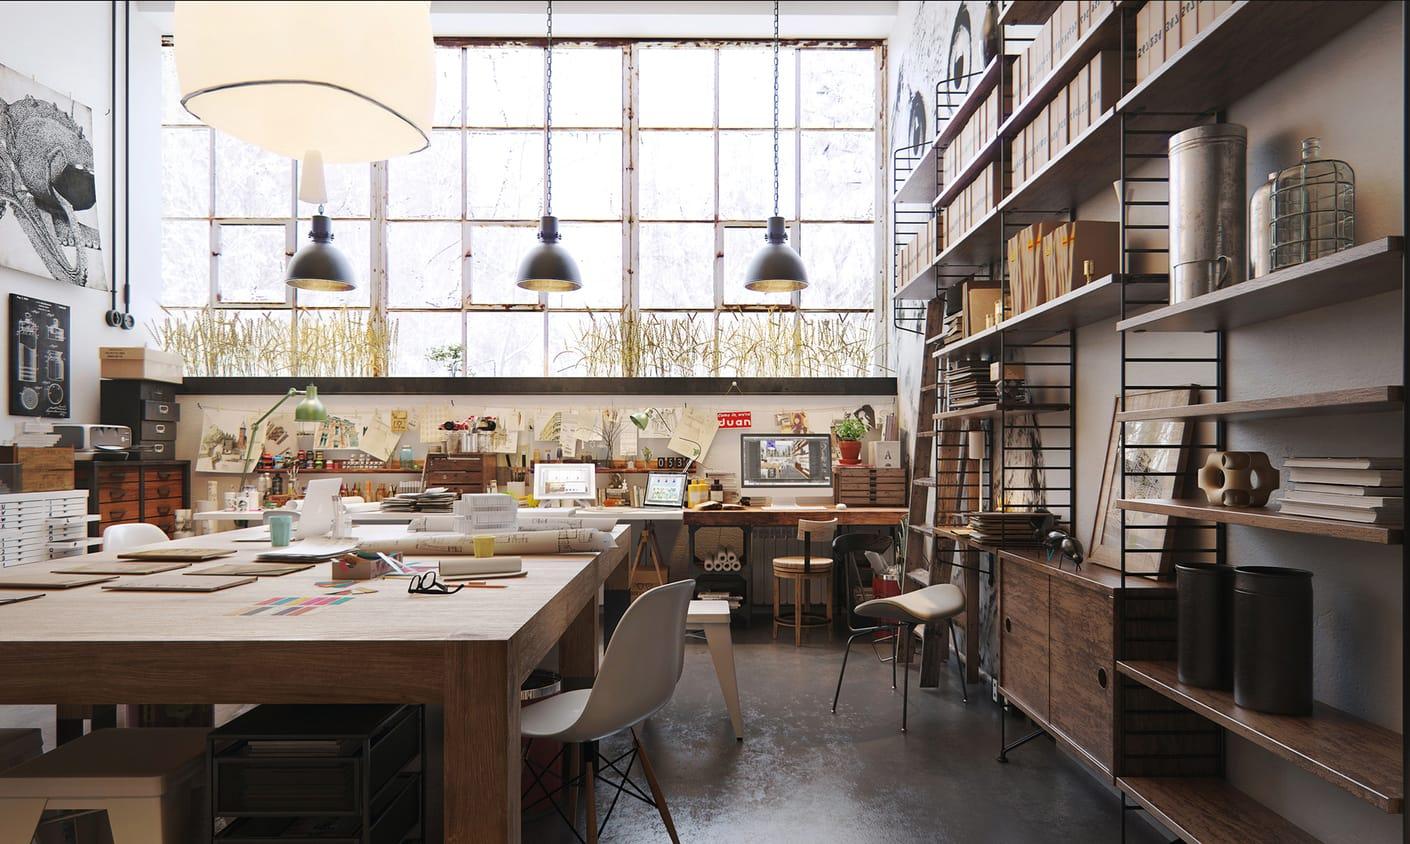 Studio atng chaos group - Interior design studio ...